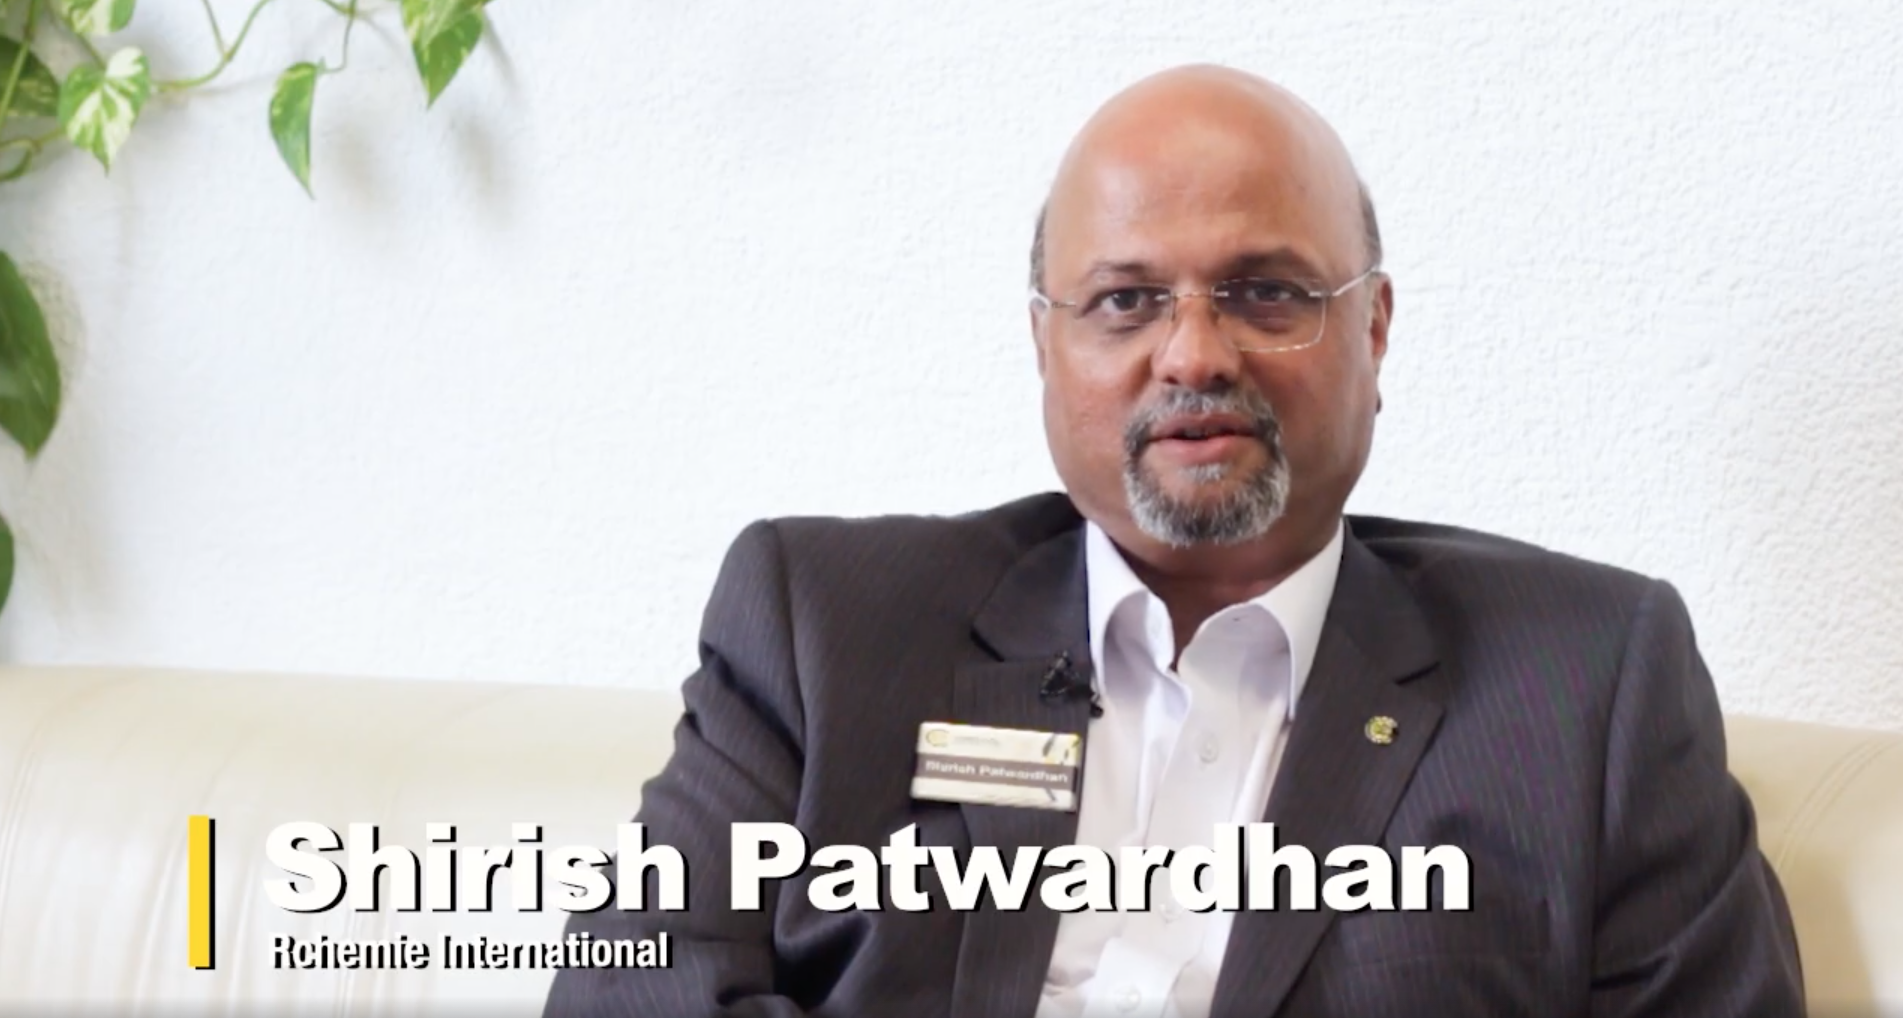 CorporateConnections -Shirish Patwardhan